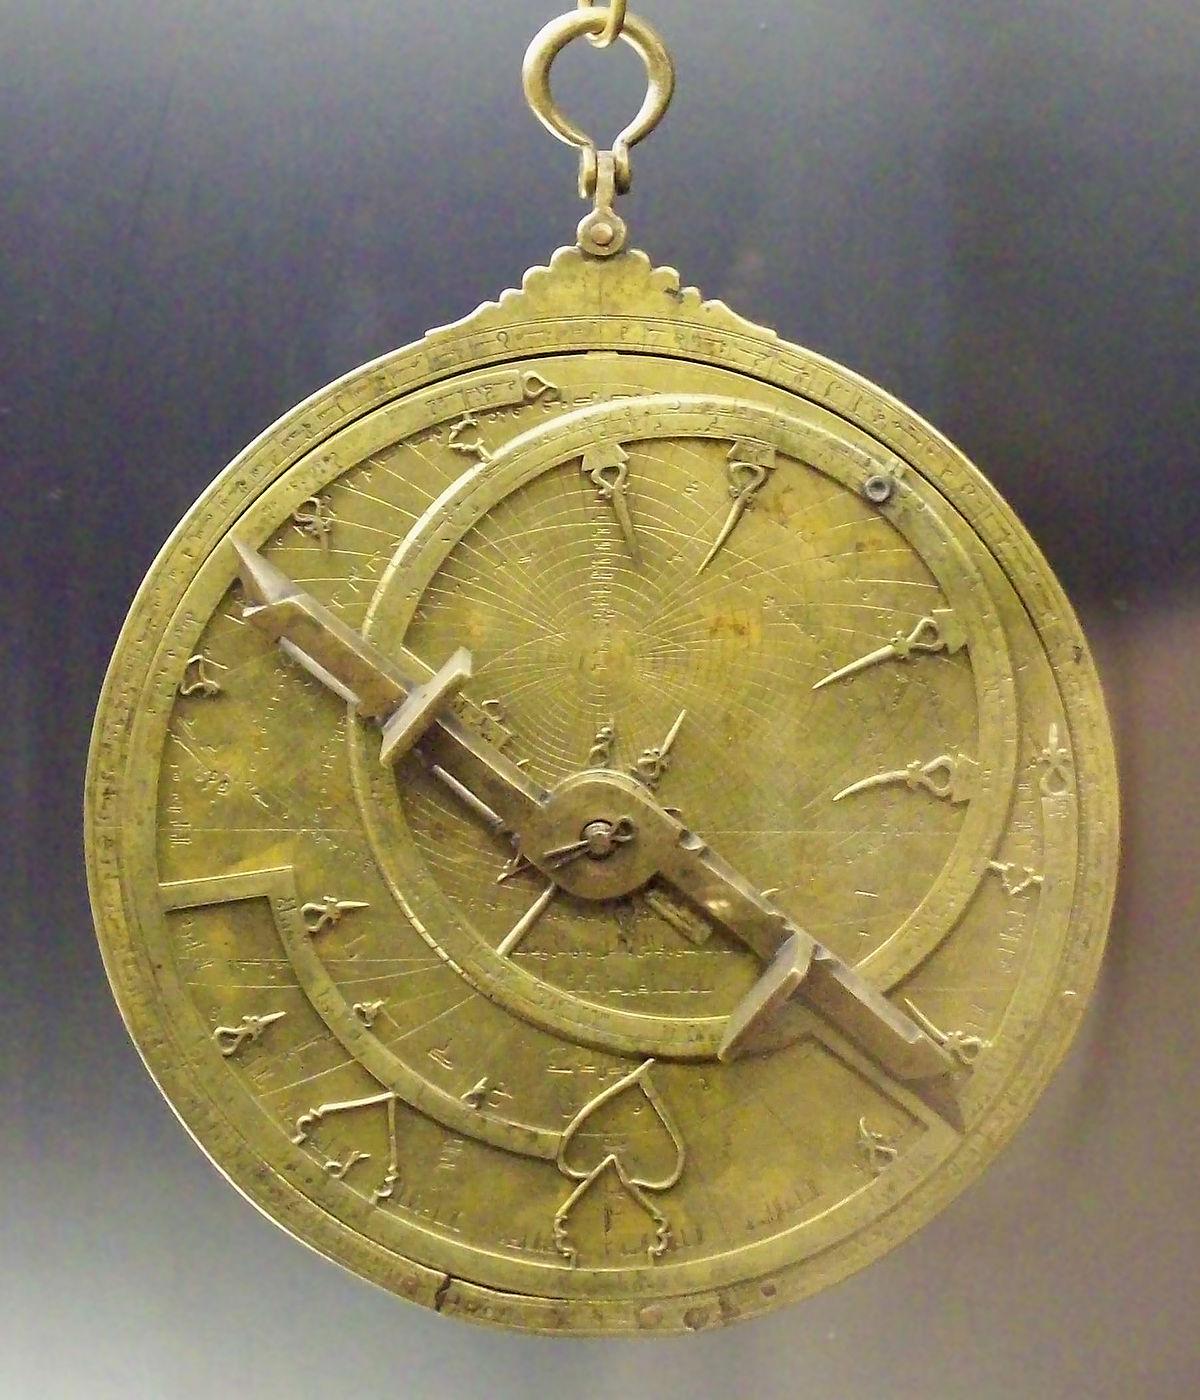 Astrolabe - Wikimedia Commons